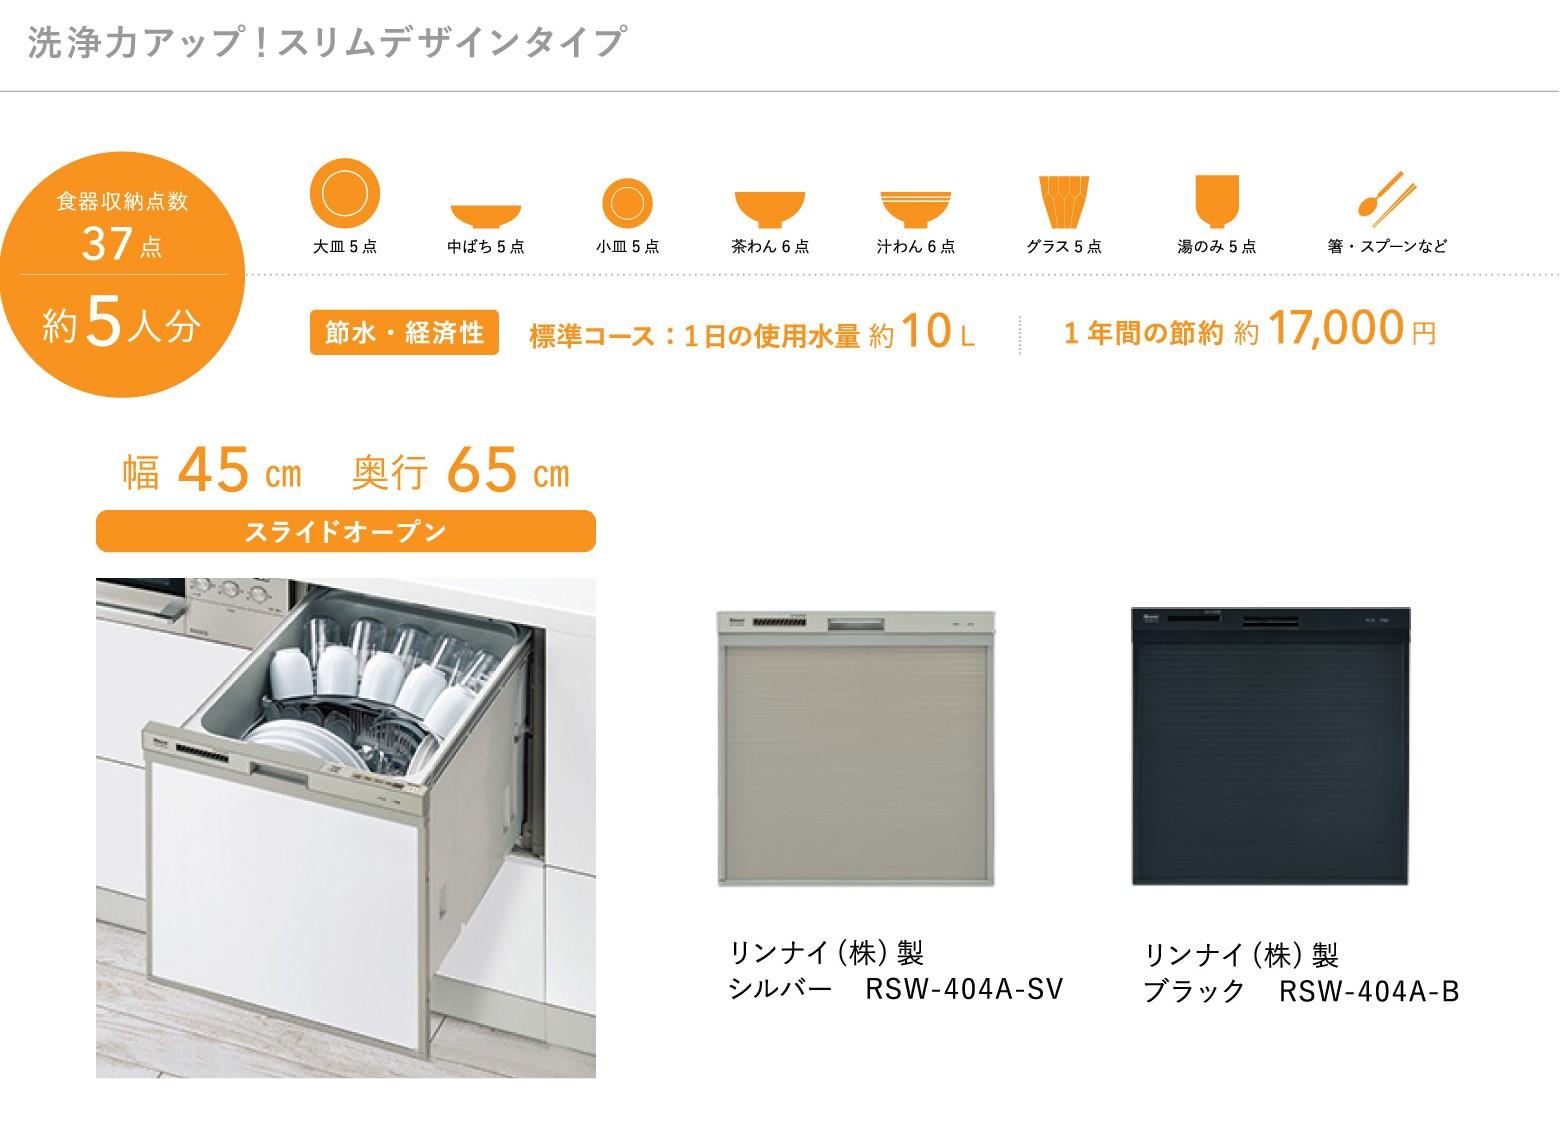 食器洗い乾燥機404A紹介